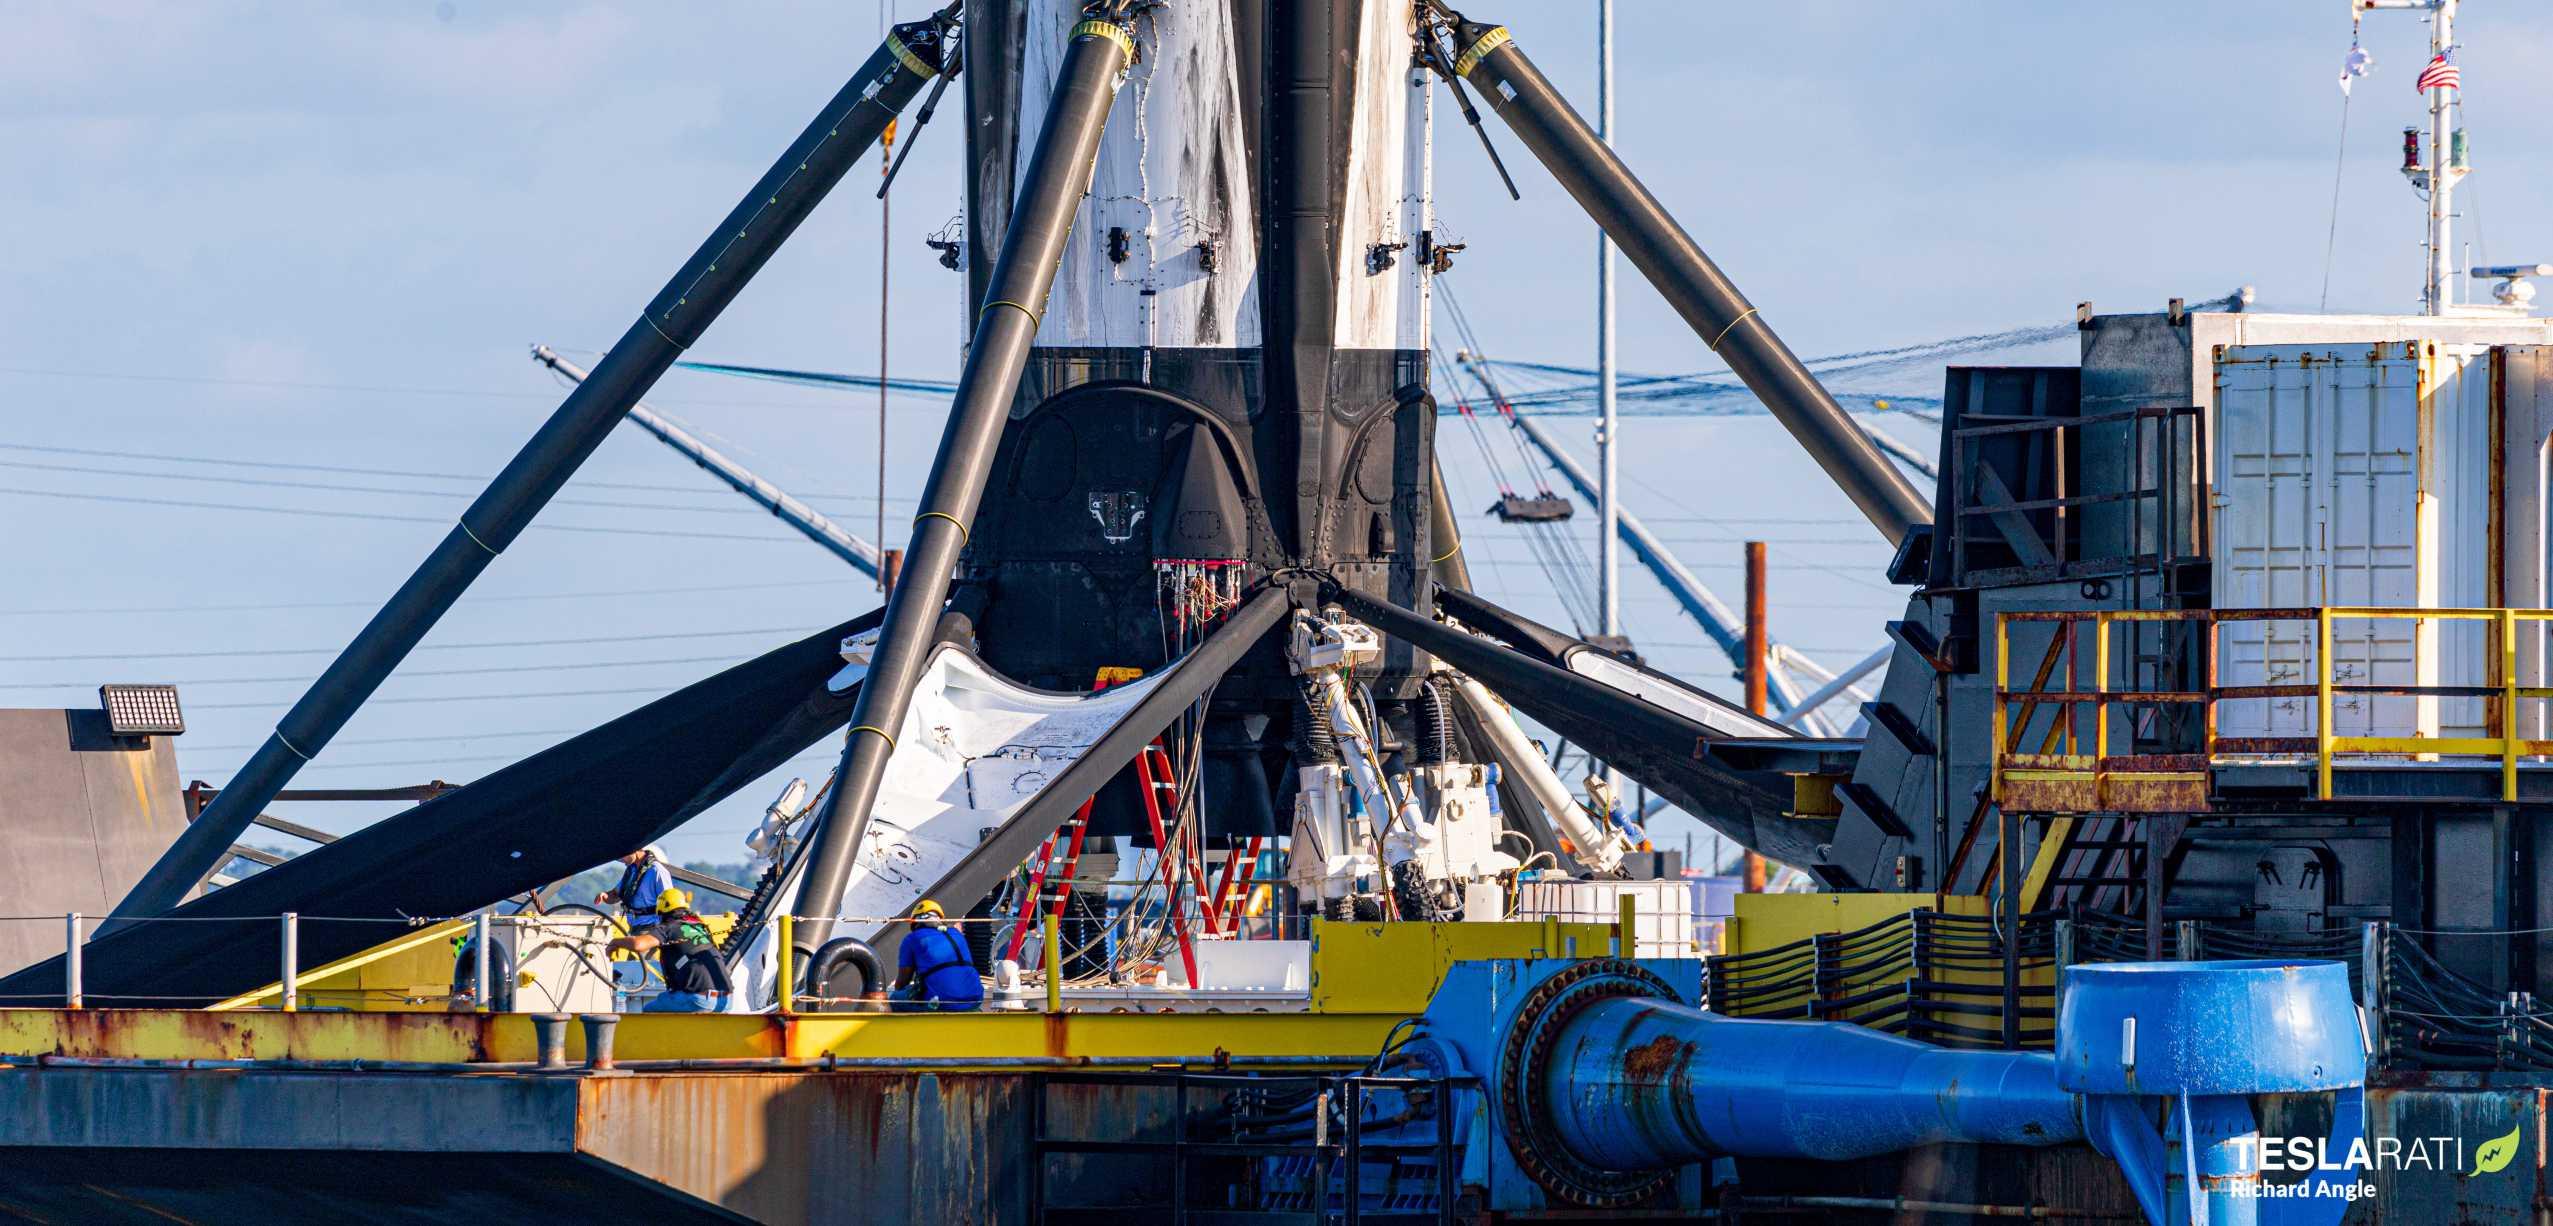 Starlink-8 Falcon 9 B1059 OCISLY return 061620 (Richard Angle) (1) (c)